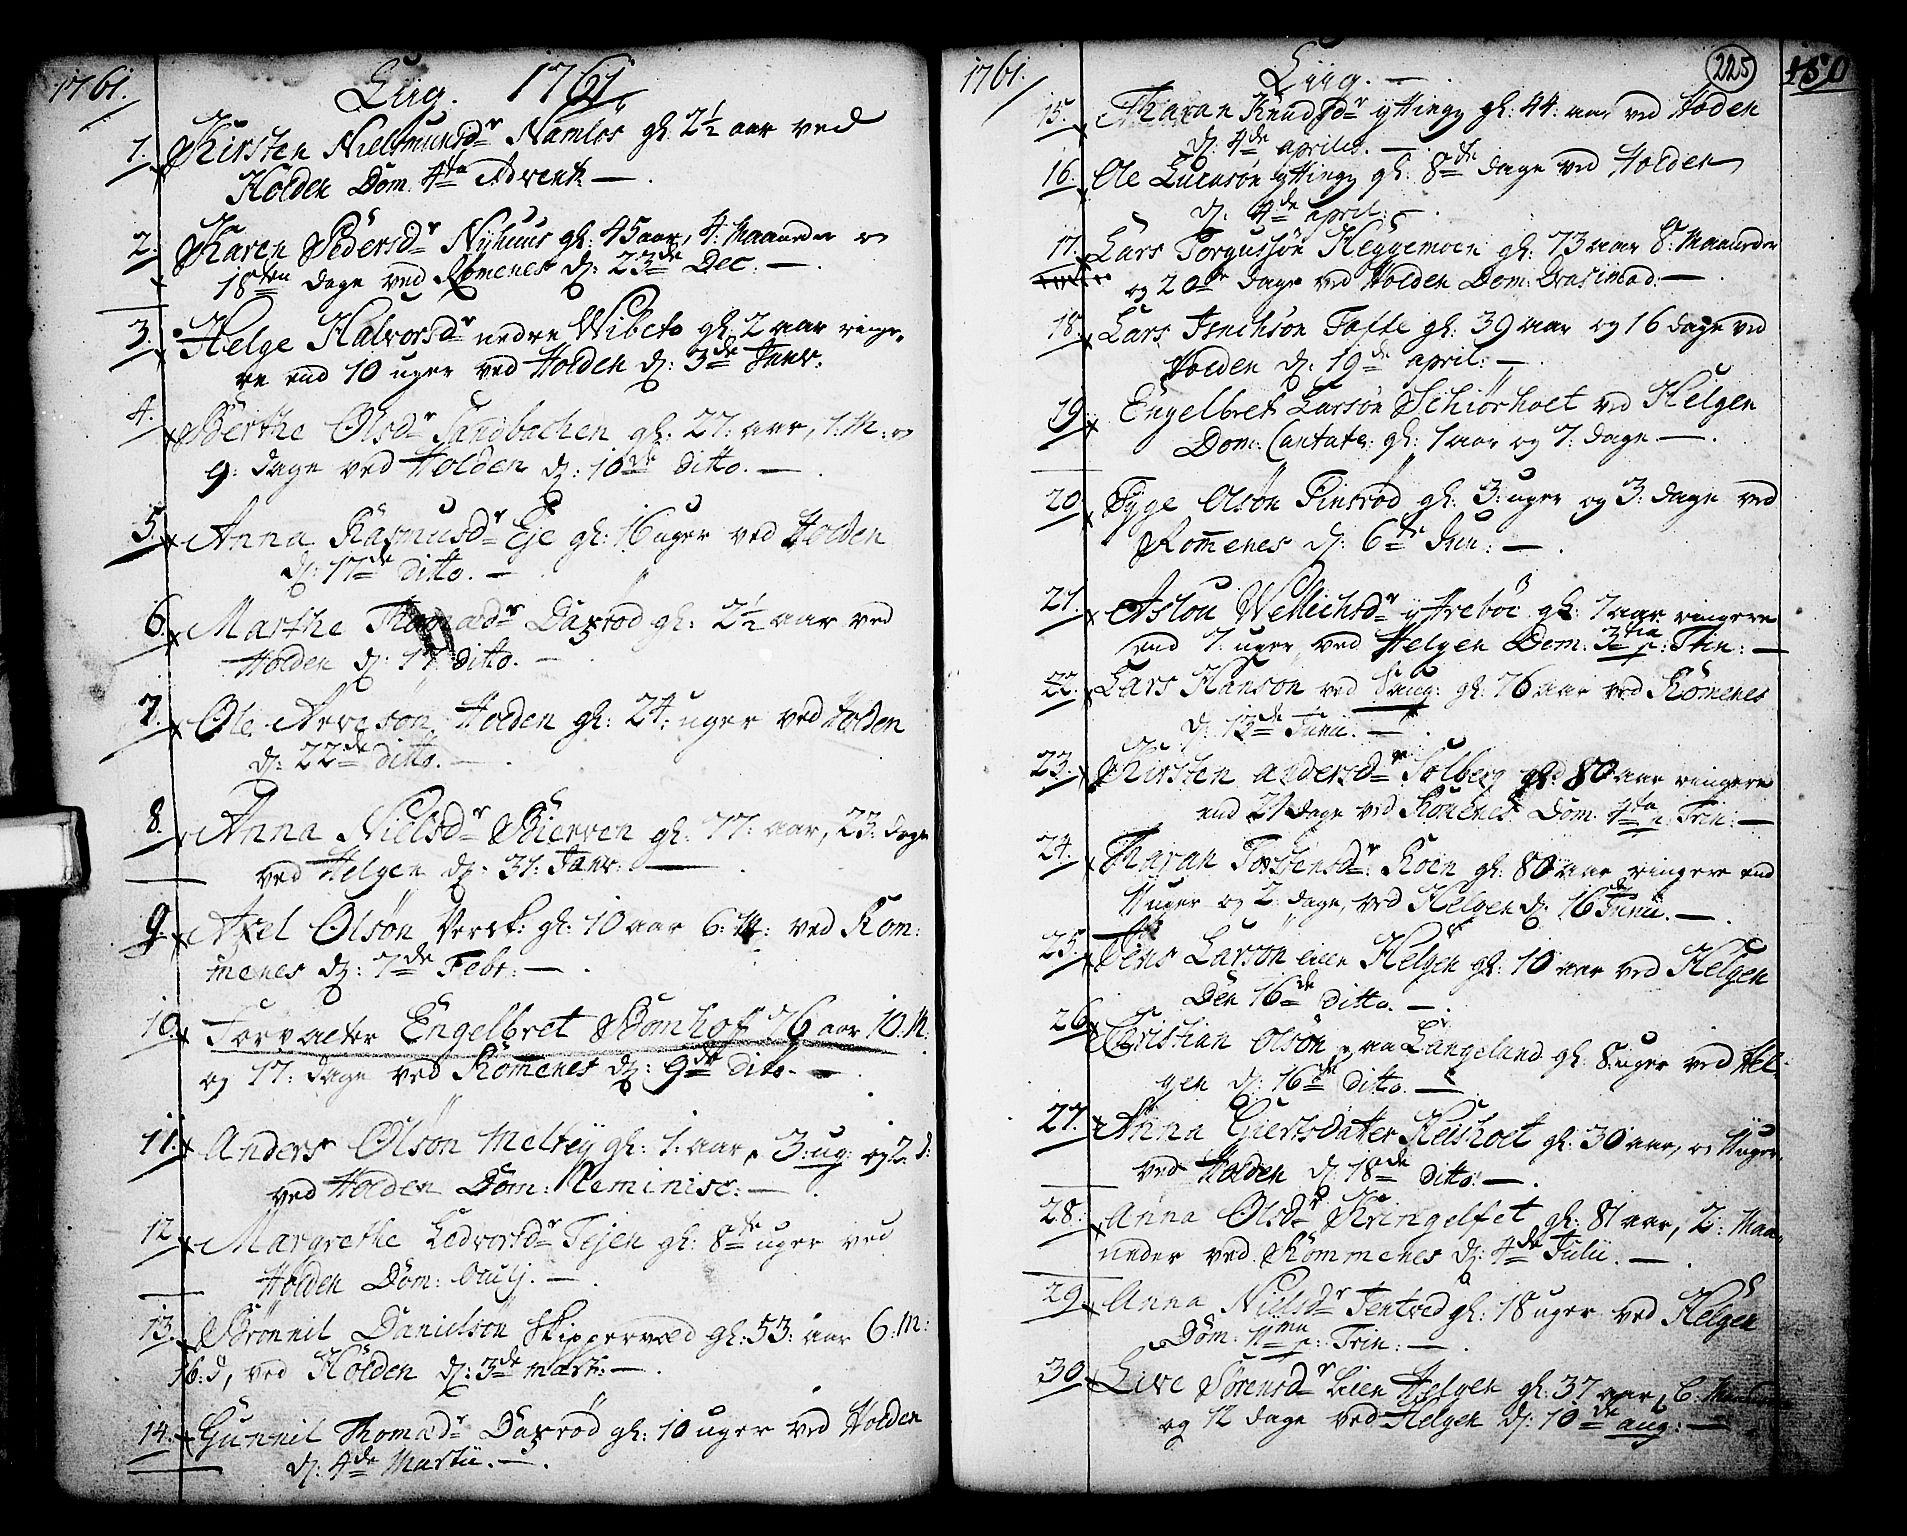 SAKO, Holla kirkebøker, F/Fa/L0001: Ministerialbok nr. 1, 1717-1779, s. 225